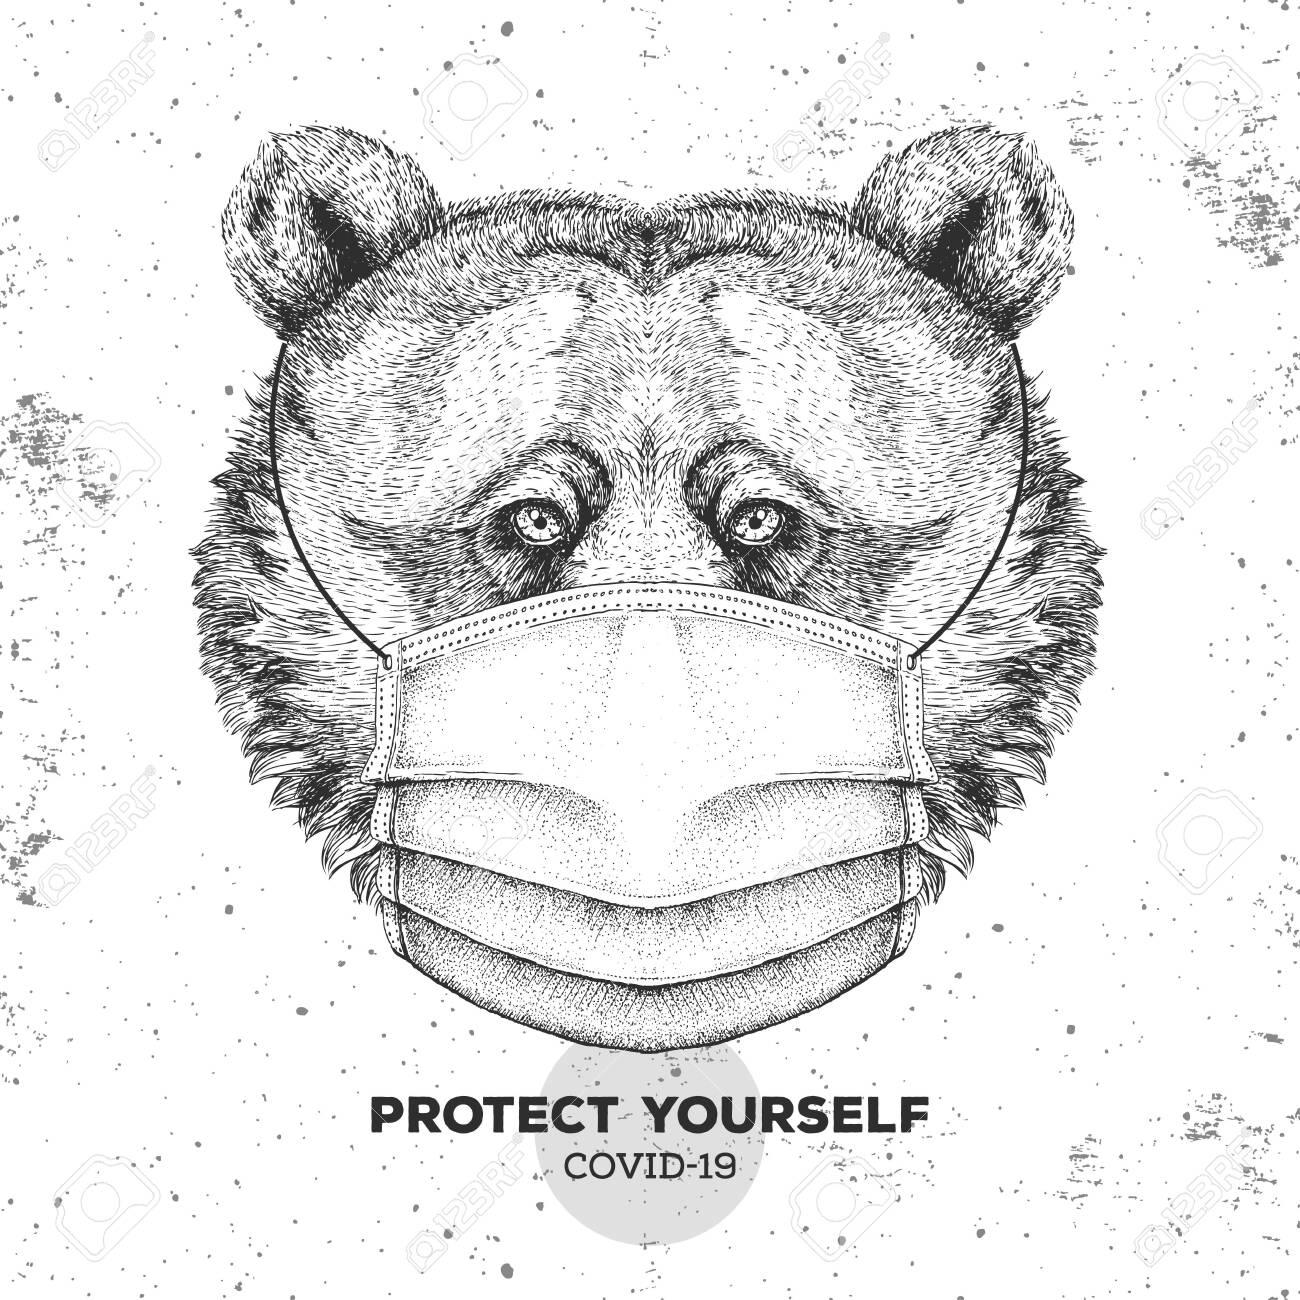 Hand drawing Animal bear wearing face medical mask. Covid-19 protection methods. Coronavirus Quarantine Warning. Vector illustration - 144246214